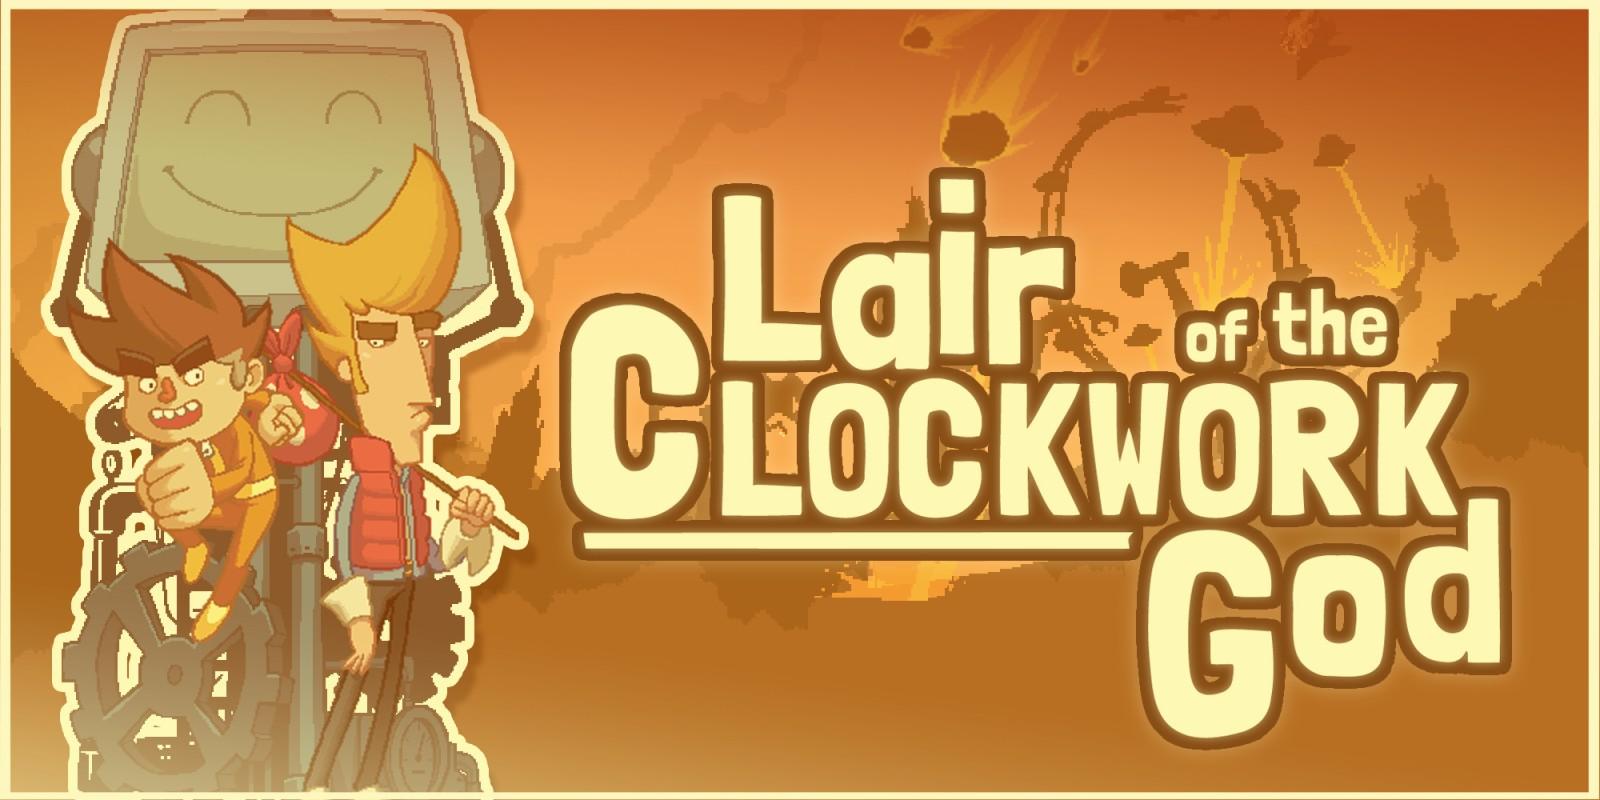 H2x1_NSwitchDS_LairOfTheClockwordGod_ima